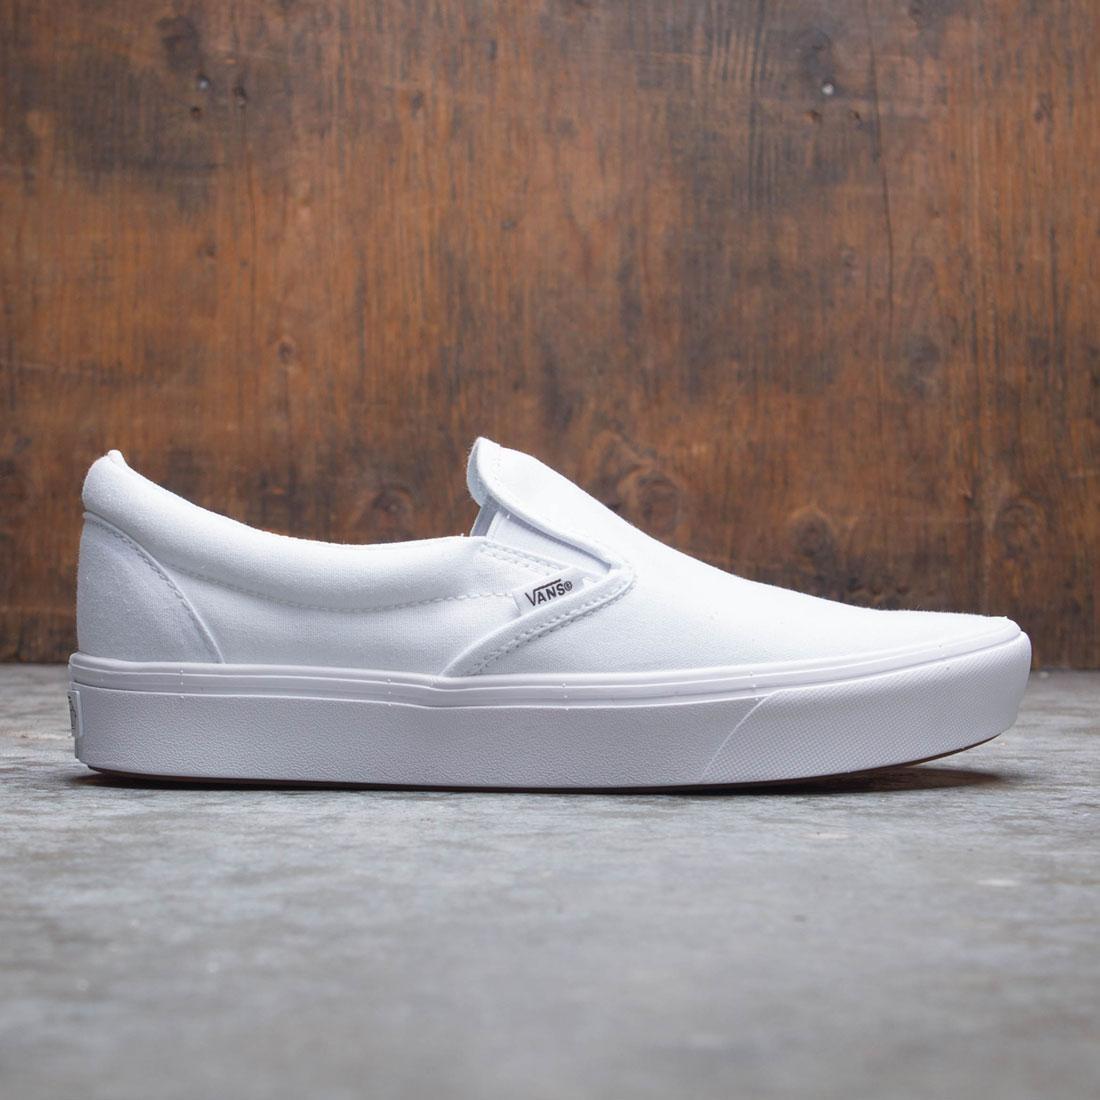 Vans Men Classic Slip-On - Comfy Cush